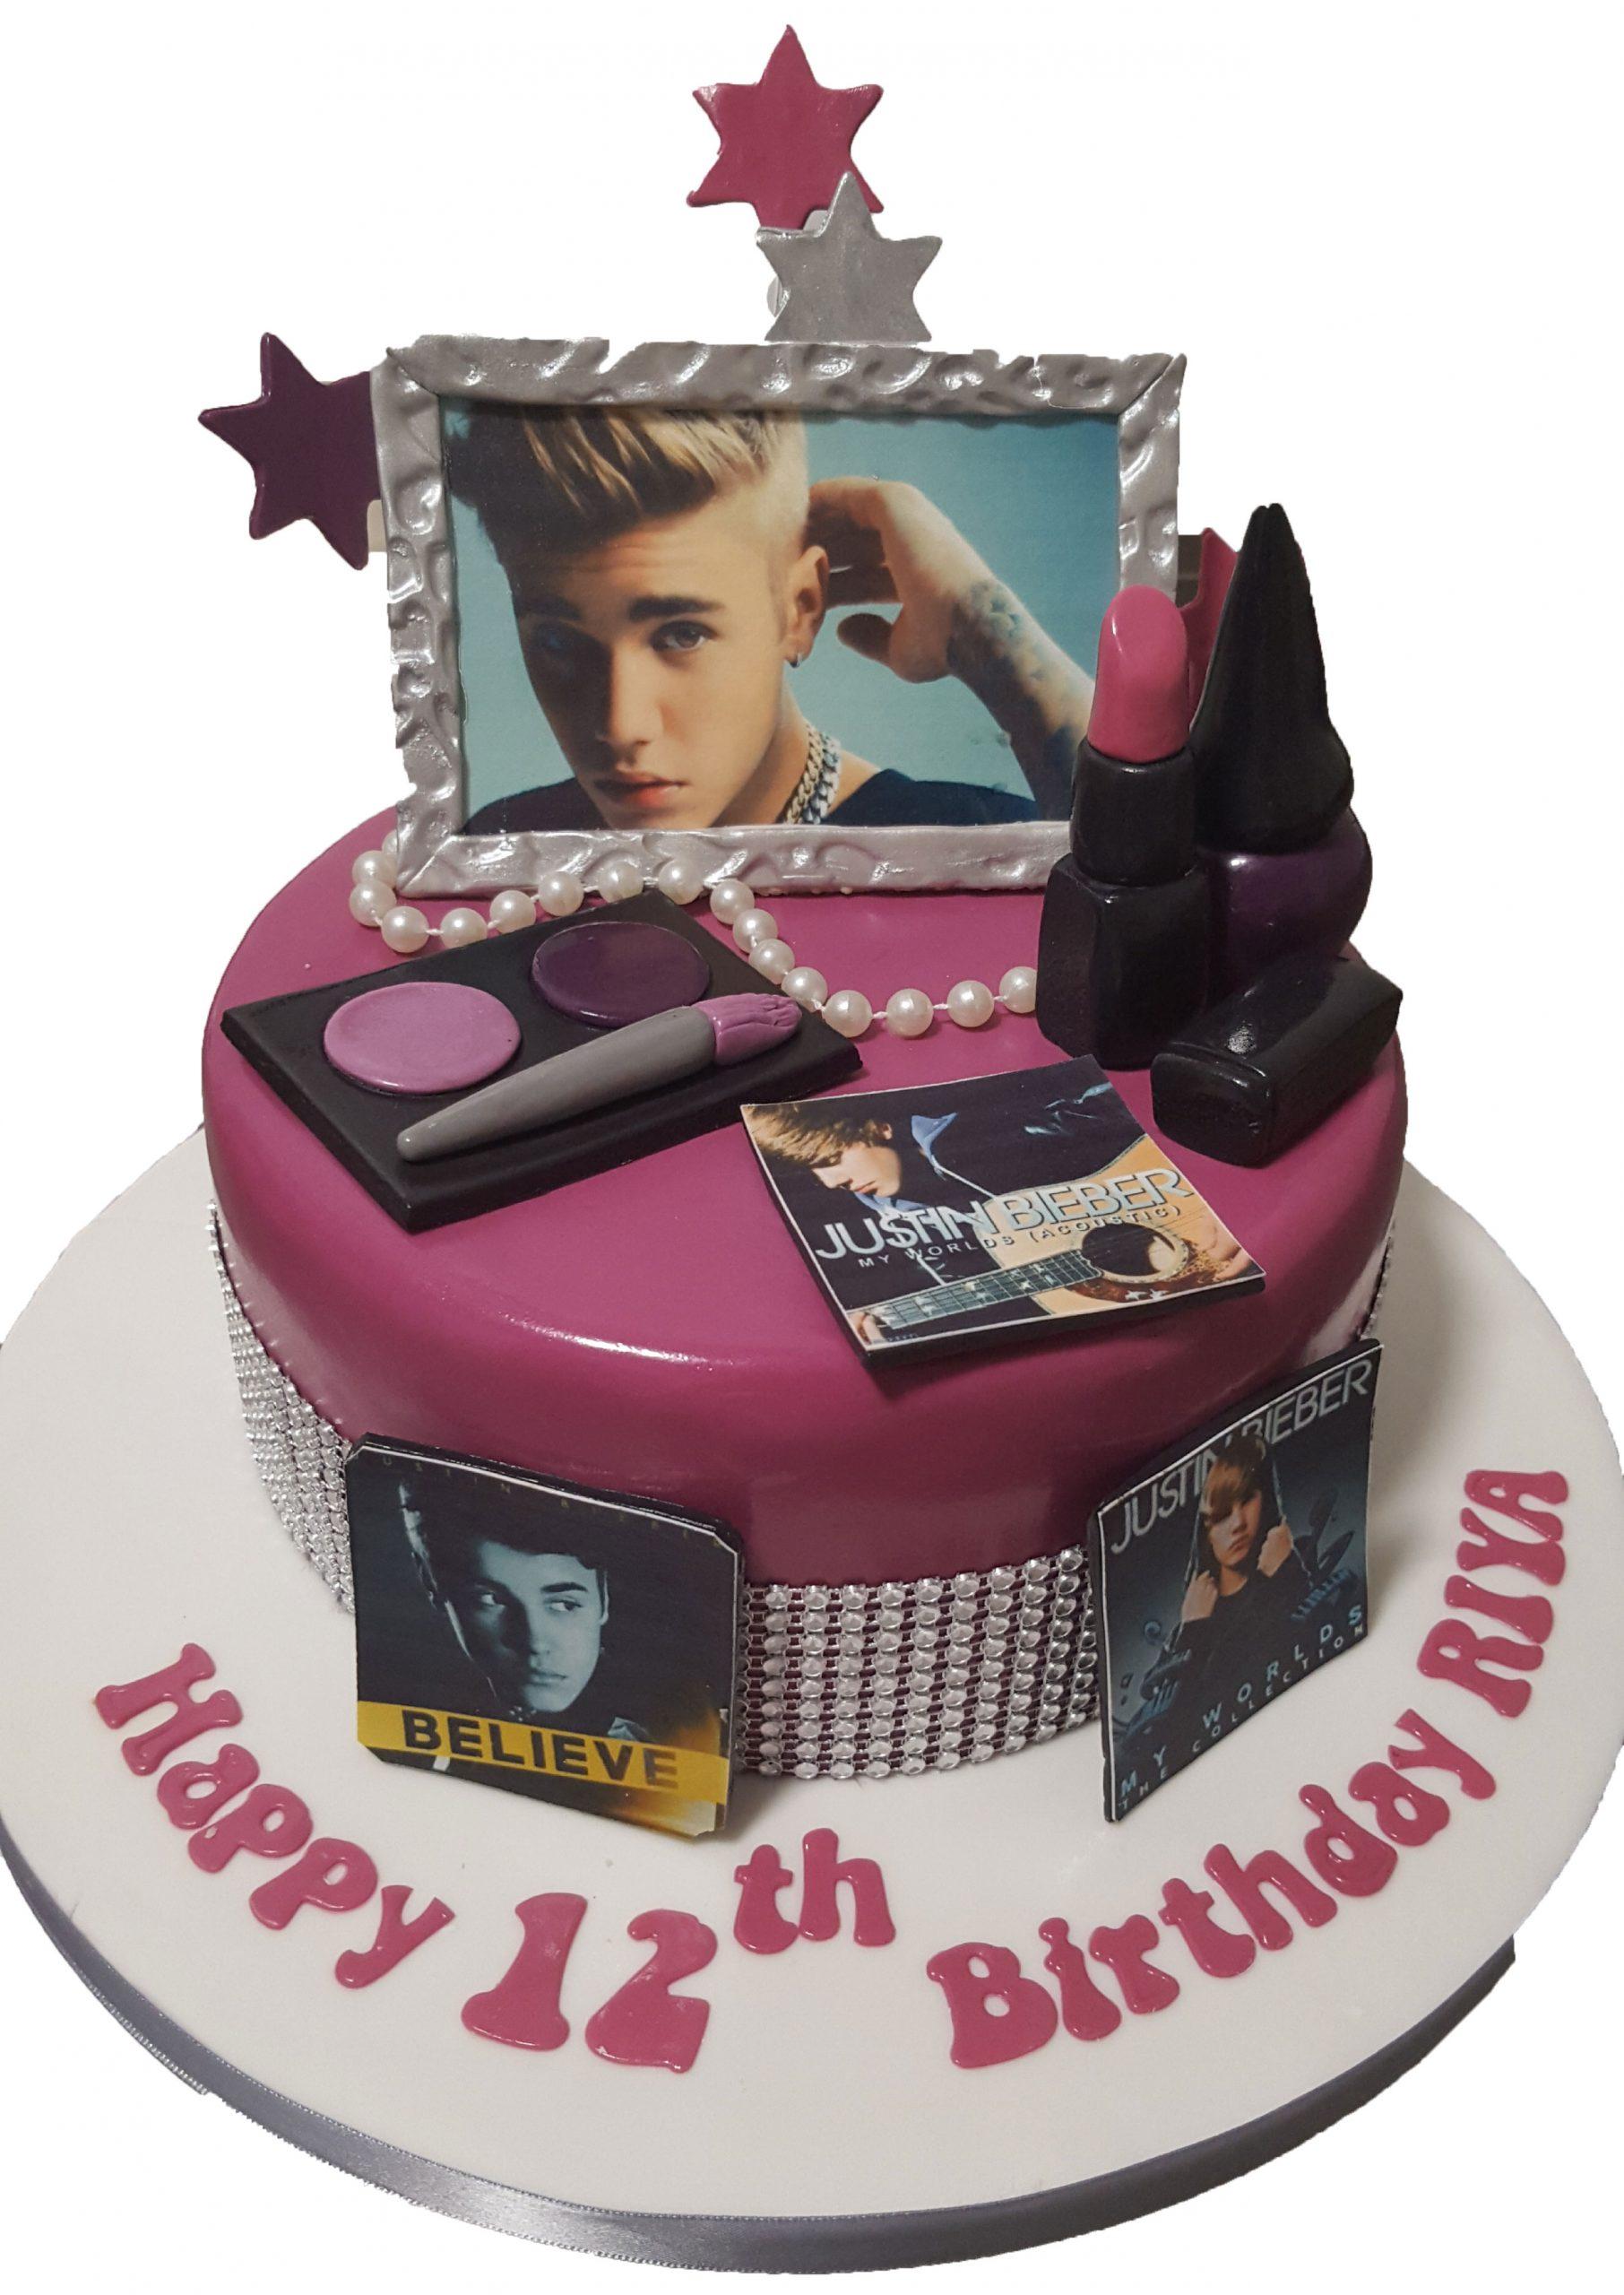 Stupendous Cake Boutique Girls Fashion Birthday Cake Cb Nc130 Cake Boutique Personalised Birthday Cards Paralily Jamesorg